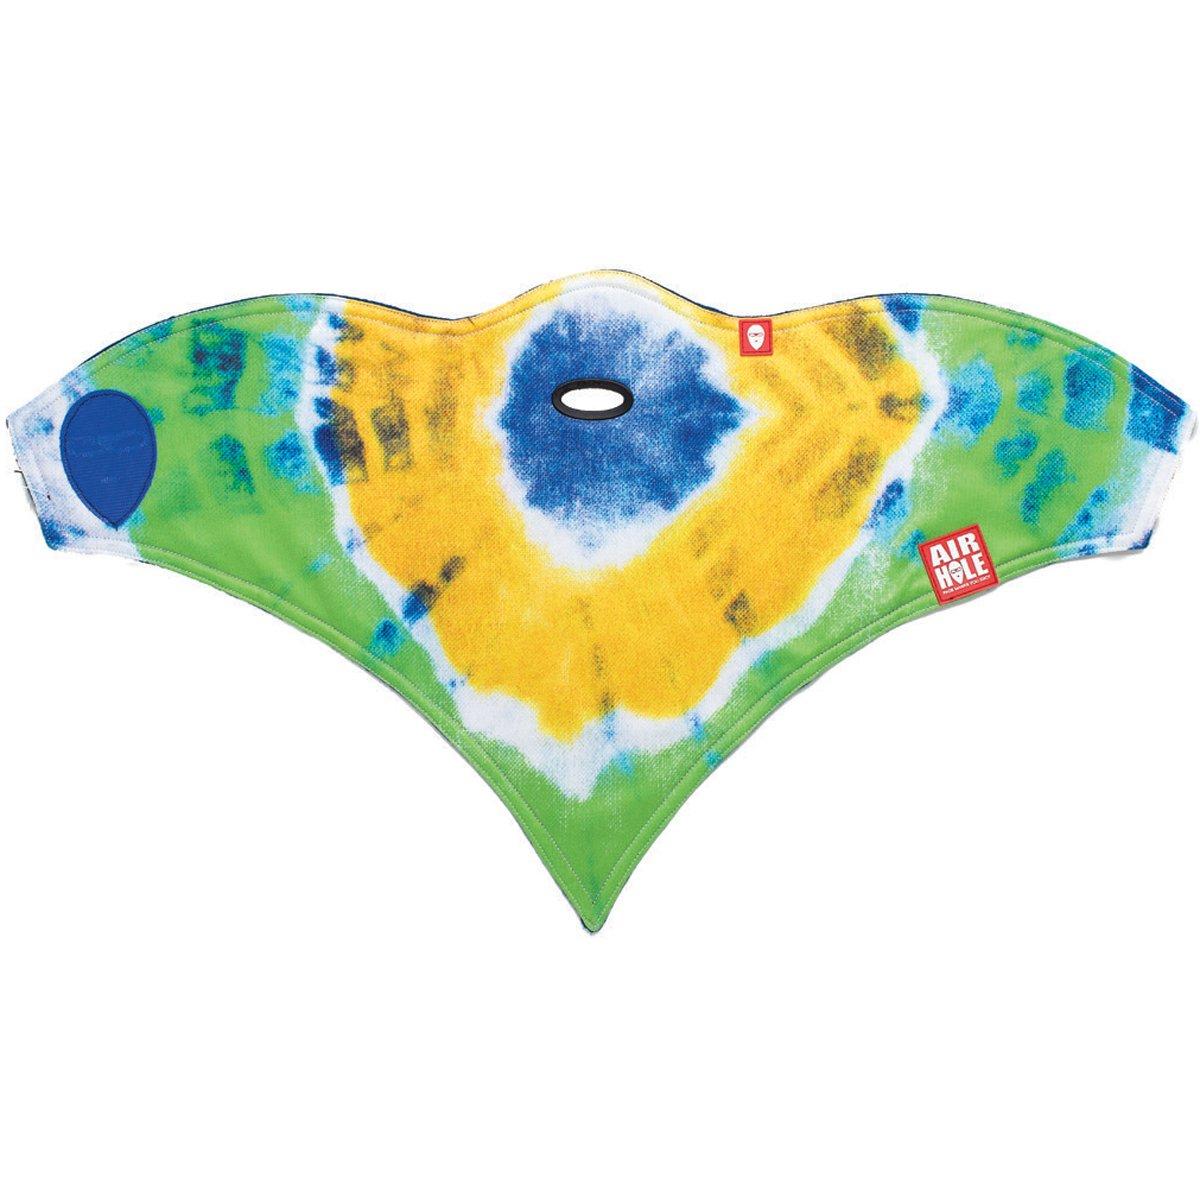 Airhole Children's Standard 1 Facemask, Tie Dye, One Size